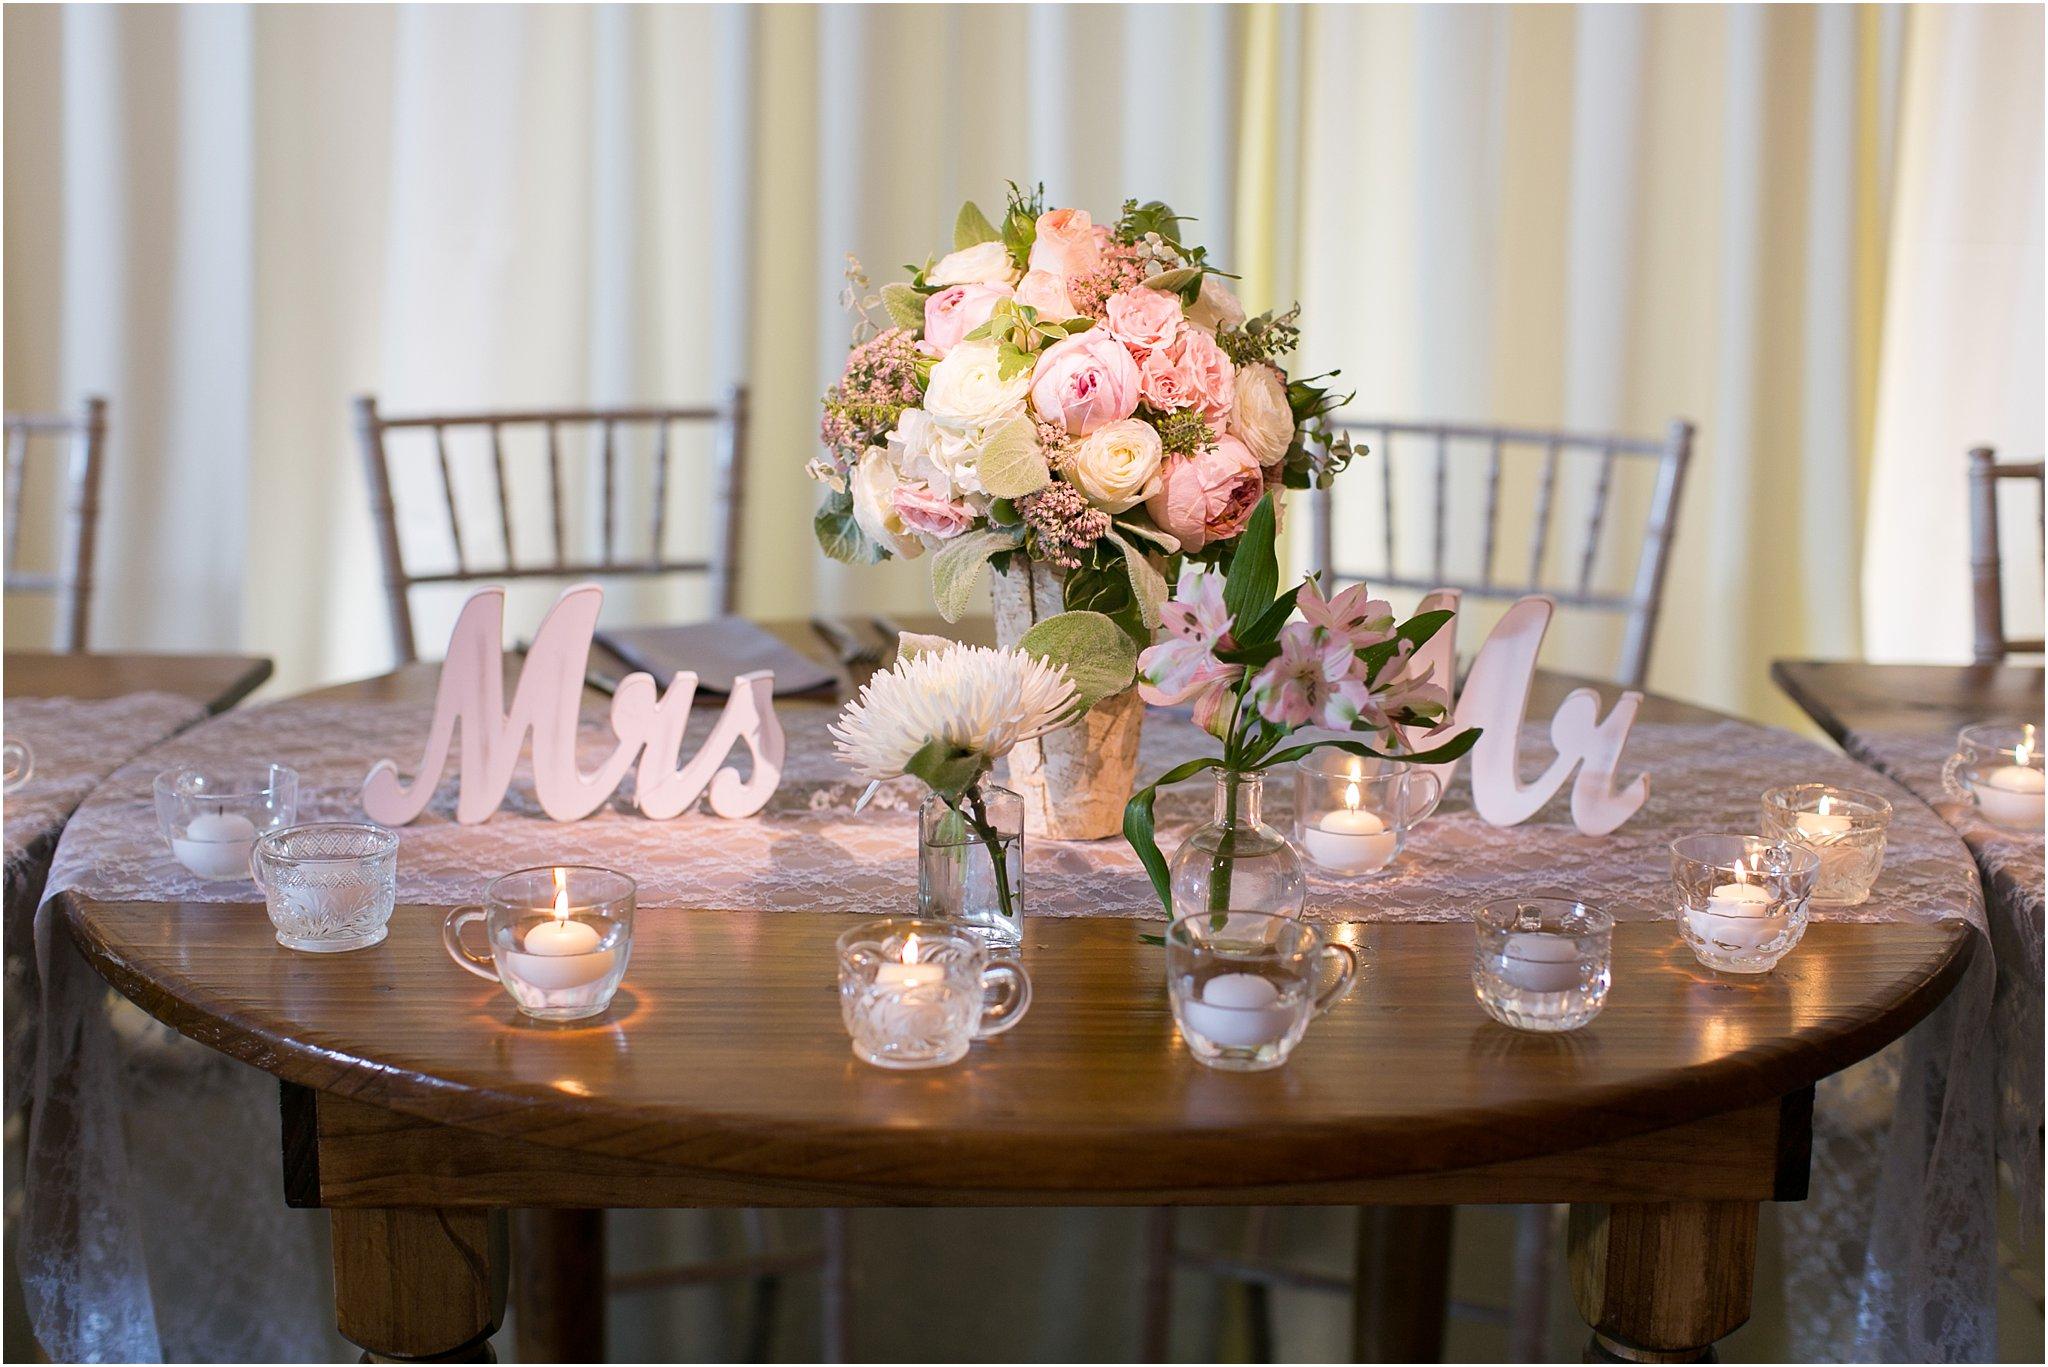 jessica_ryan_photography_virginia_wedding_photographer_wedding_hurricane_norfolk_botanical_gardens_hurricane_matthew_wedding_3623